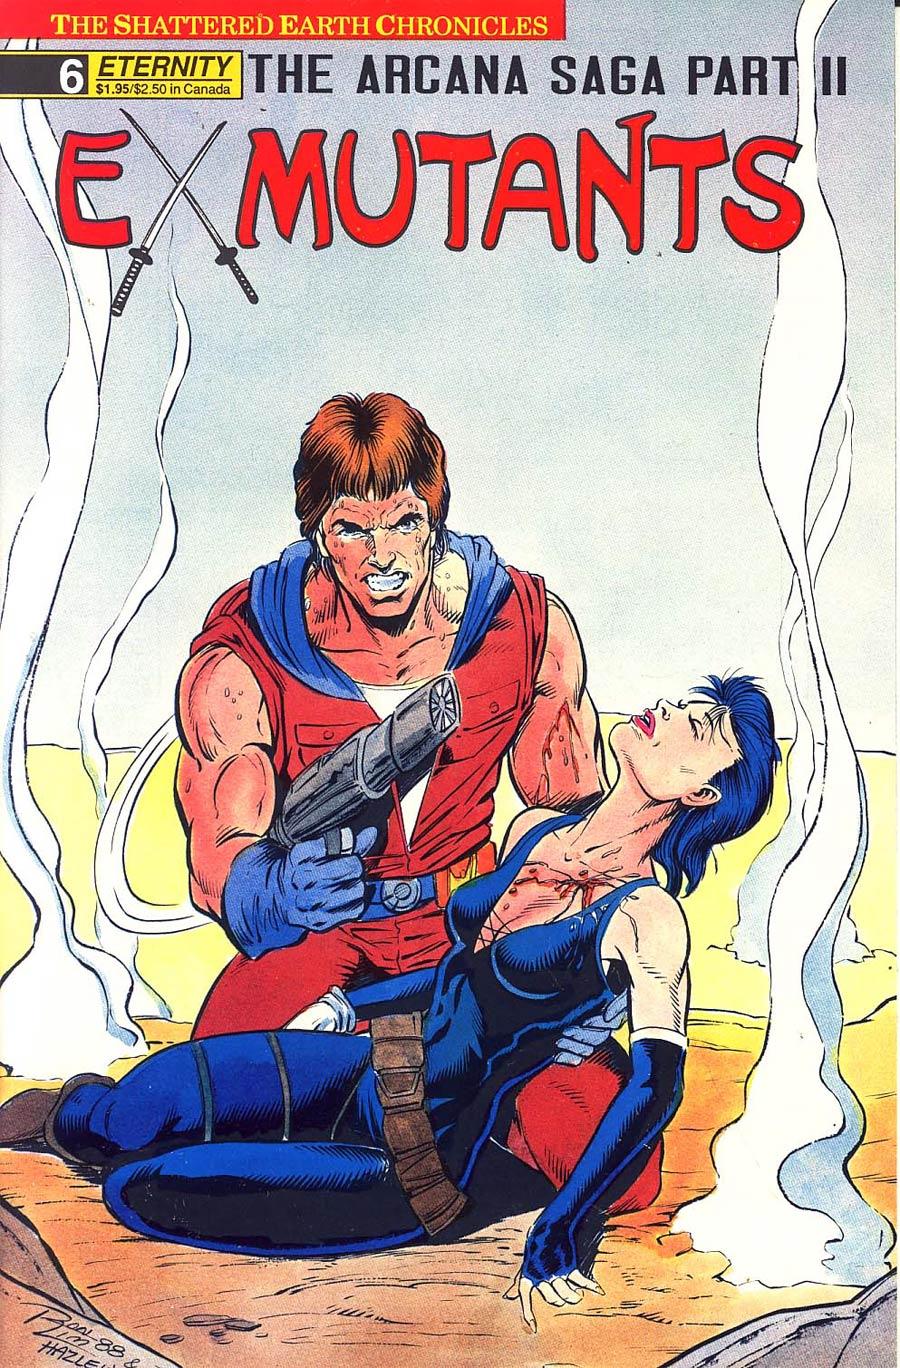 Ex-Mutants Shattered Earth Chronicles #6